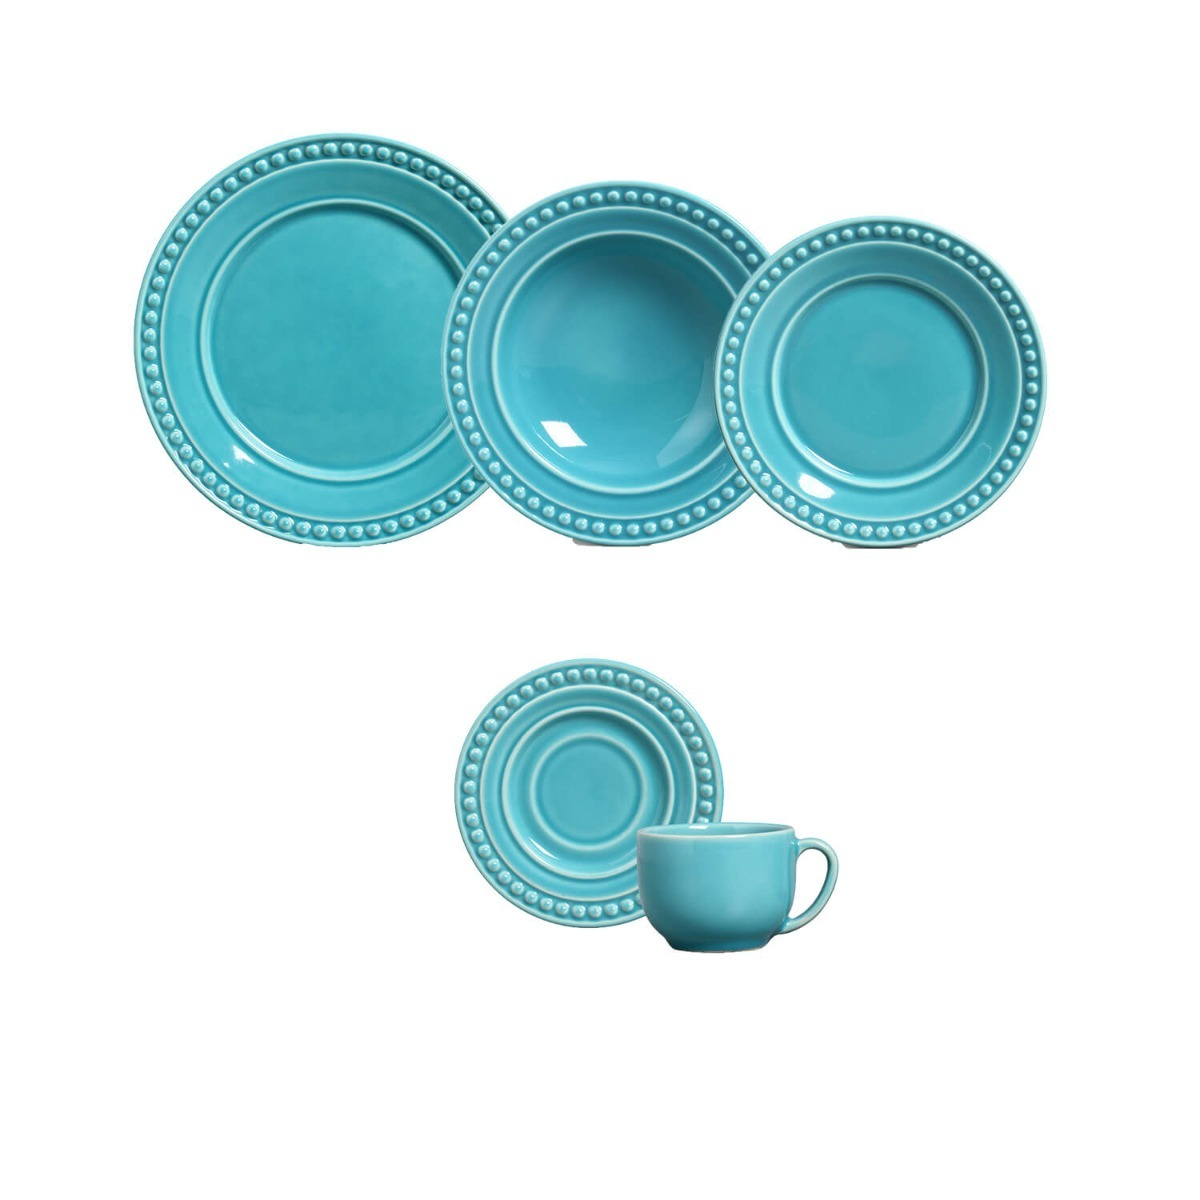 Aparelho De Jantar 30 Pecas Atenas Azul Poppy Porto Brasil R 556